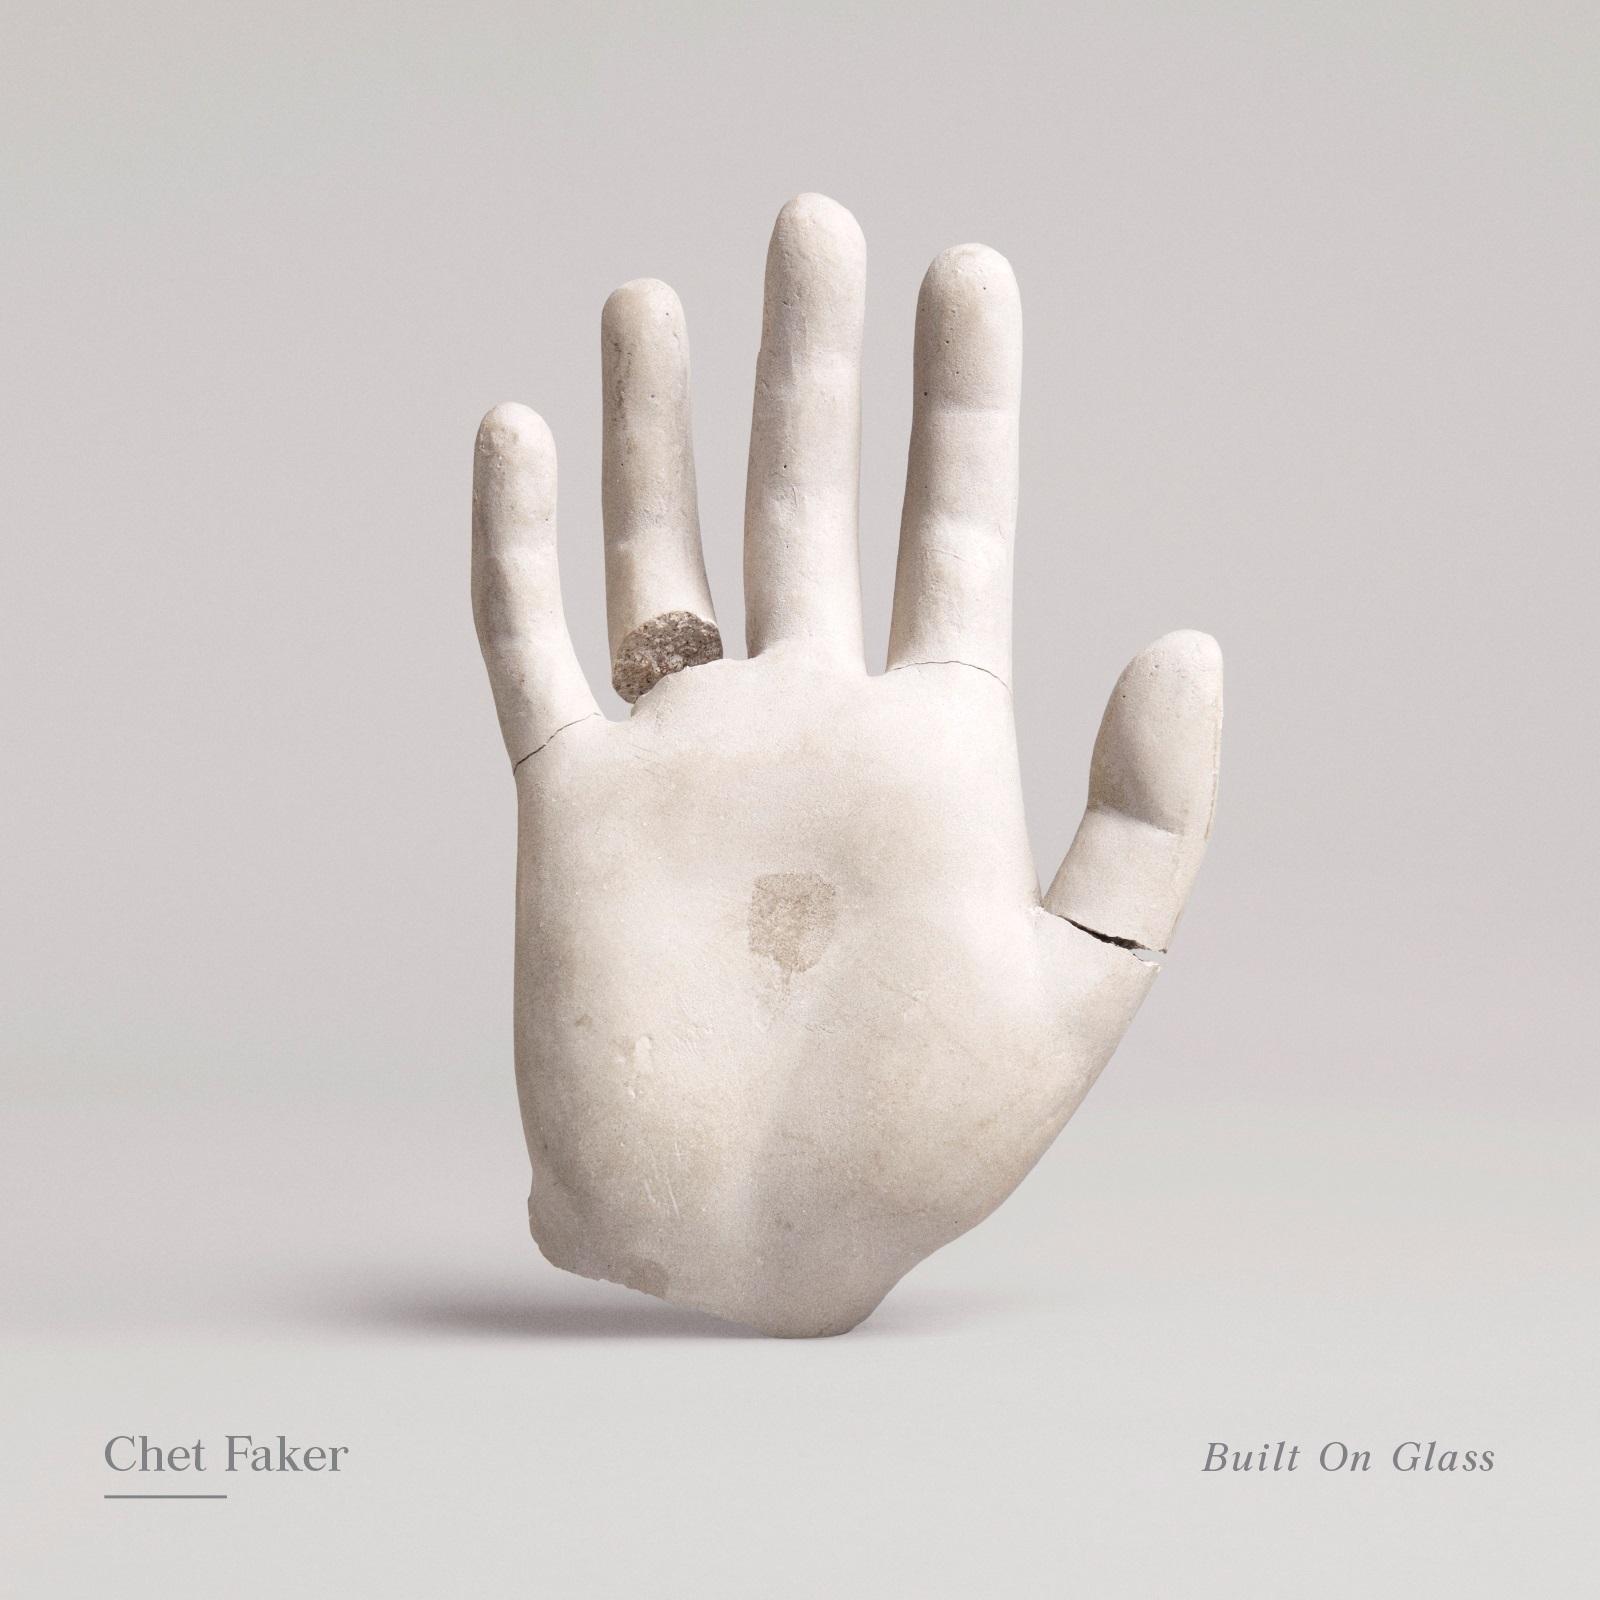 Built on Glass by Chet Faker image